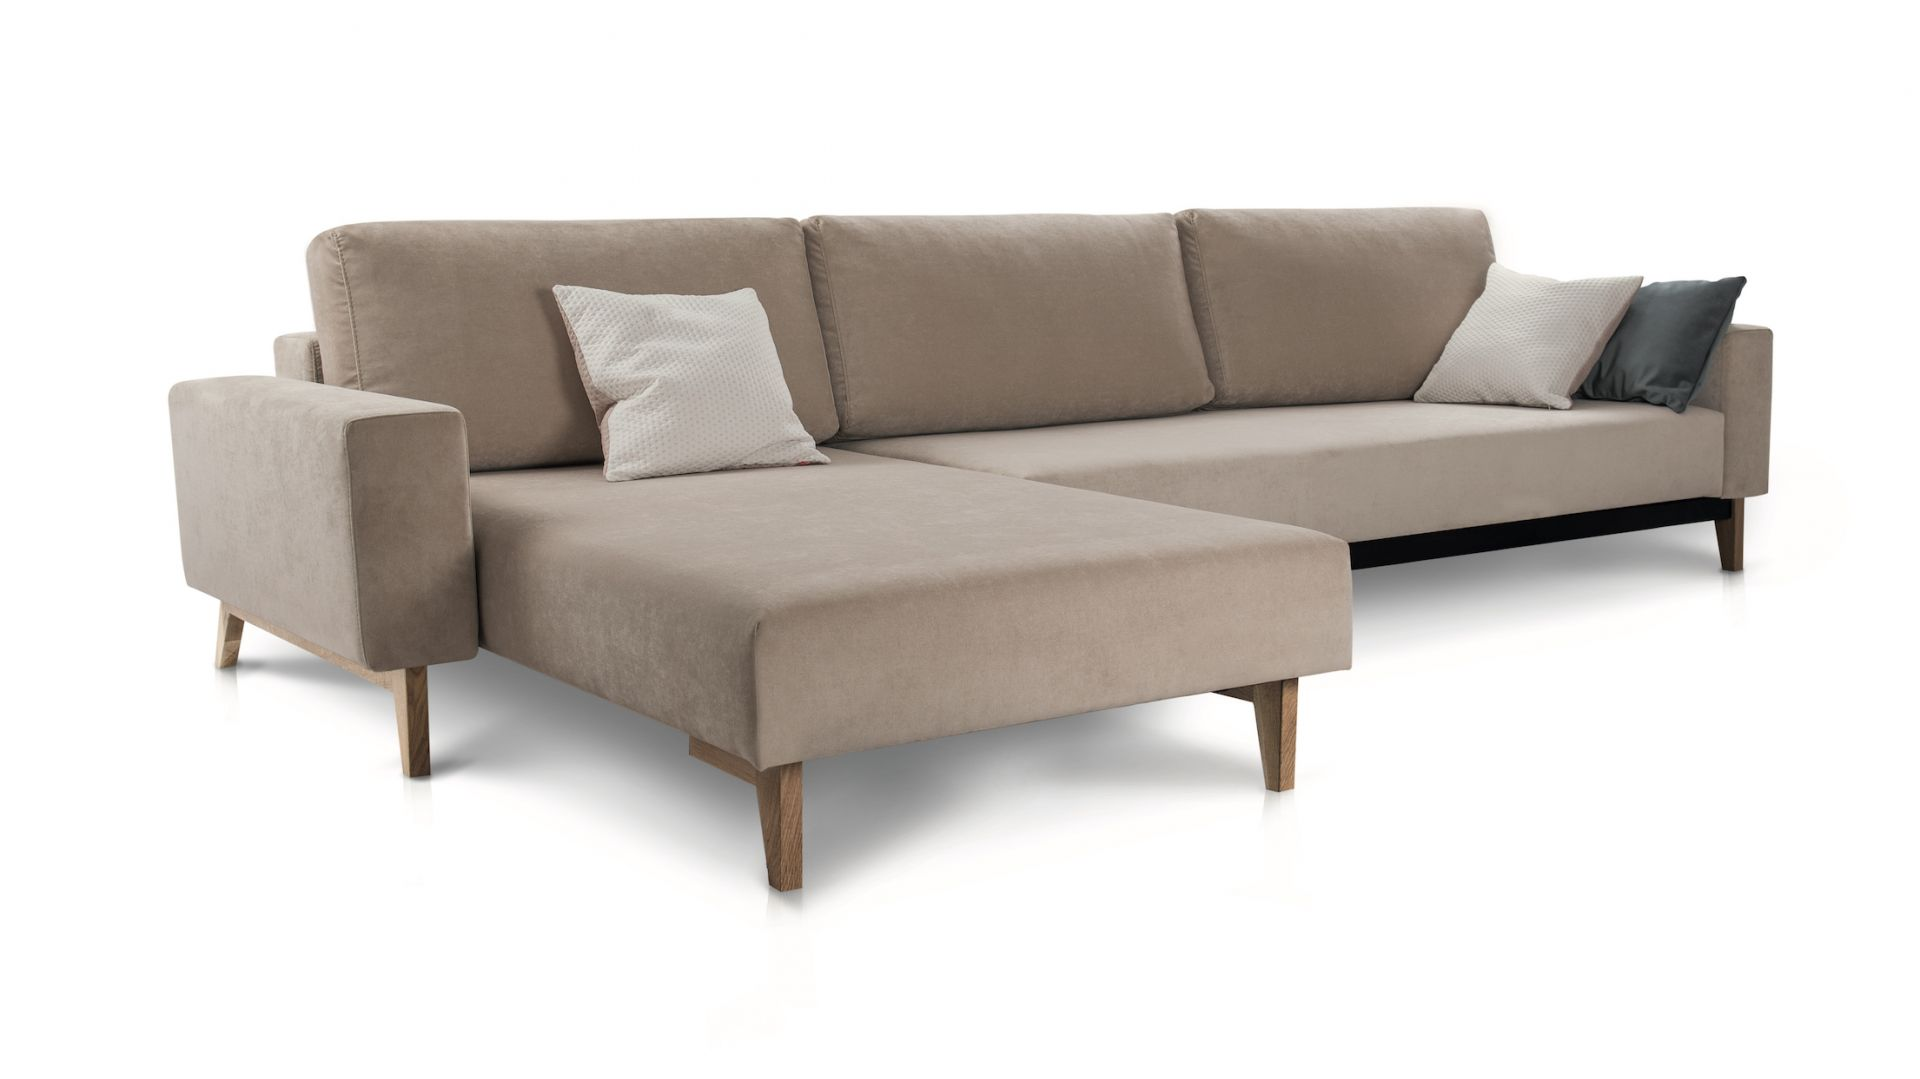 Sofa Duna. Fot. Inspirium